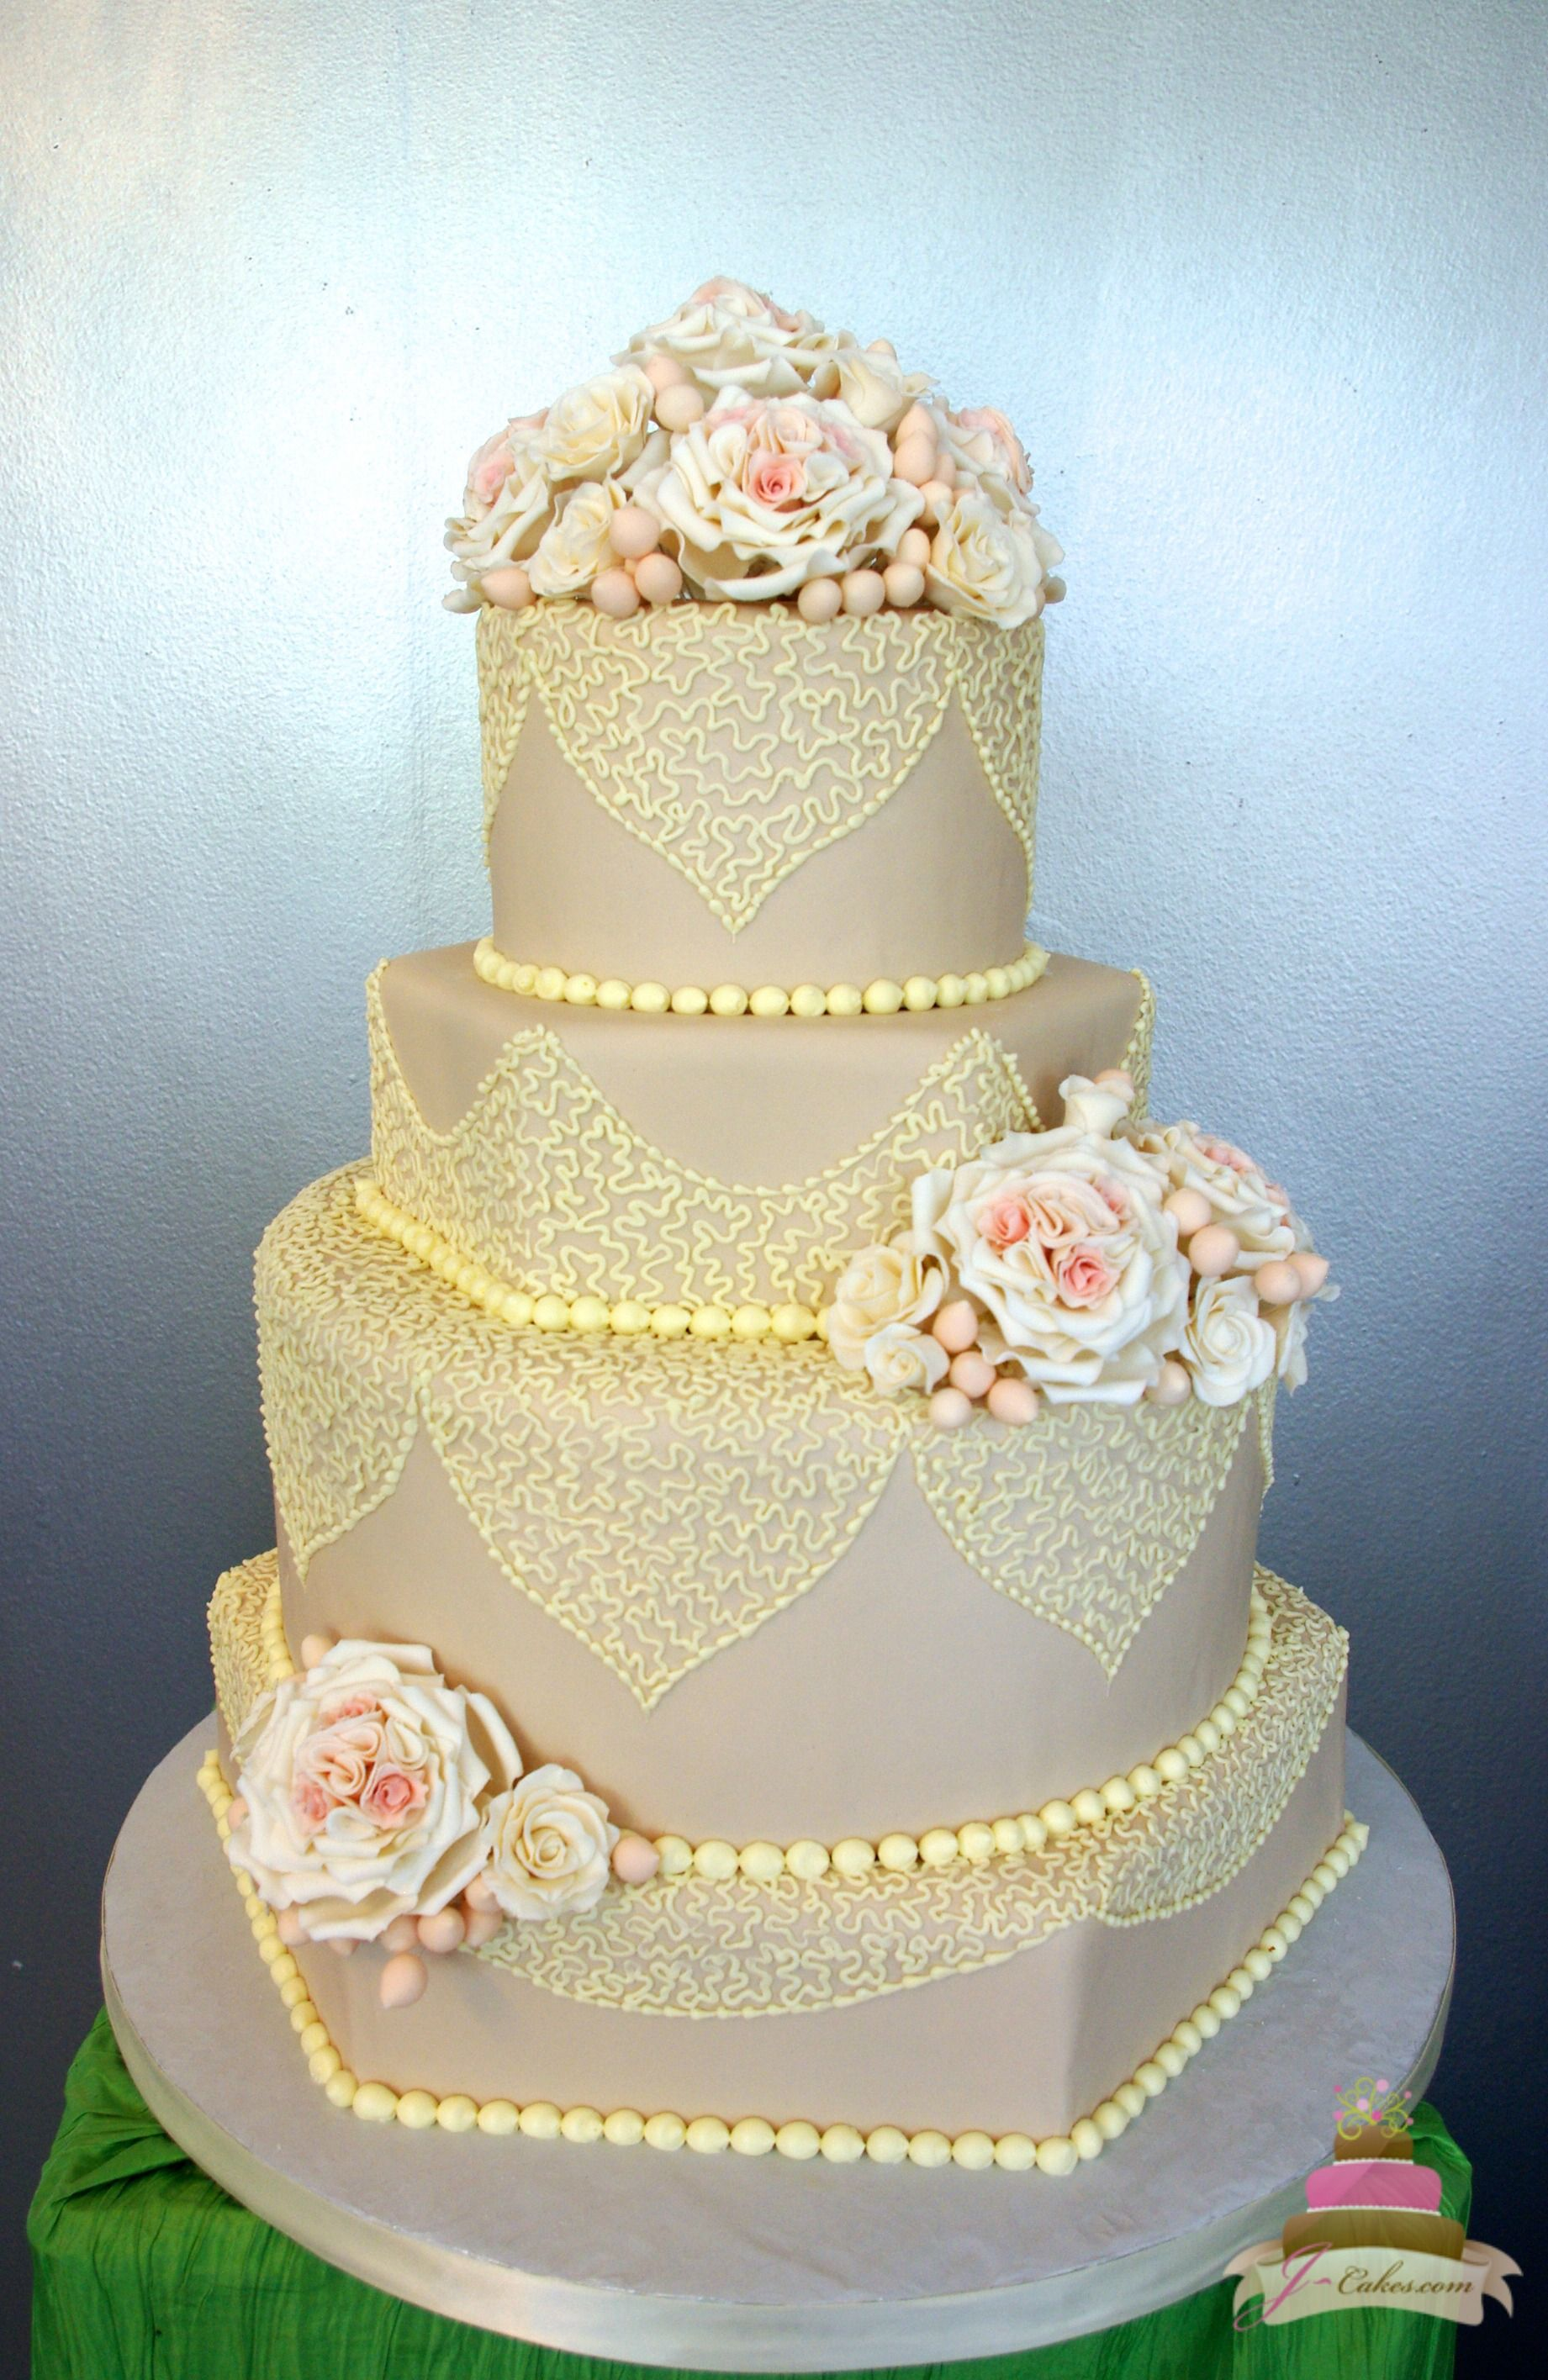 1150) Taupe Fondant and Lace Wedding Cake | steph james wedding ...